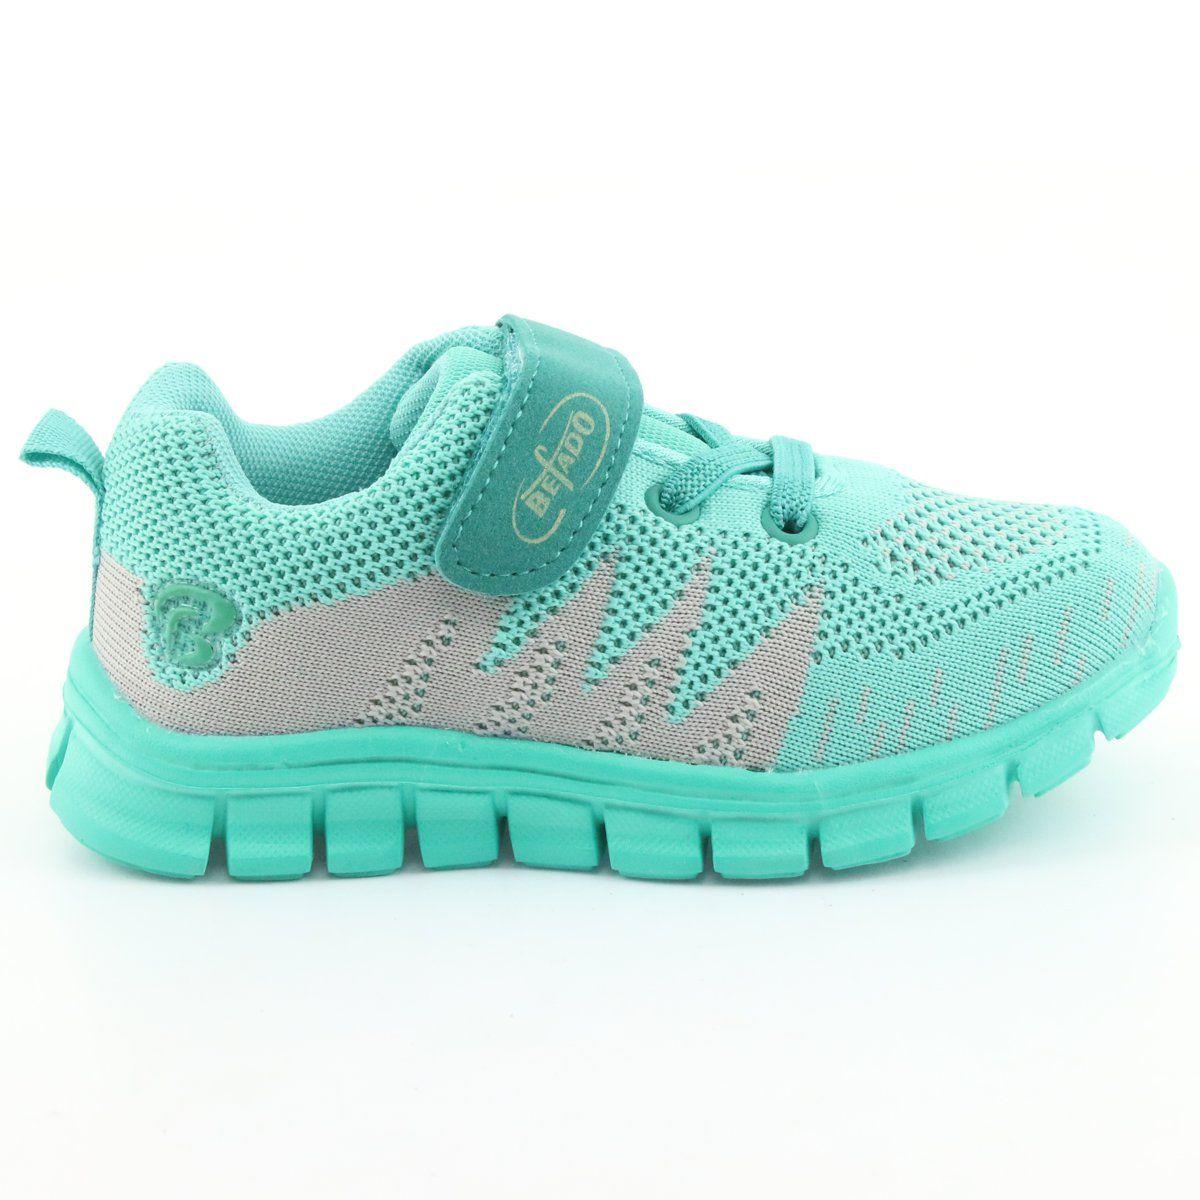 Befado Obuwie Dzieciece Do 23 Cm 516x026 Zielone Sketchers Sneakers Shoes Sneakers